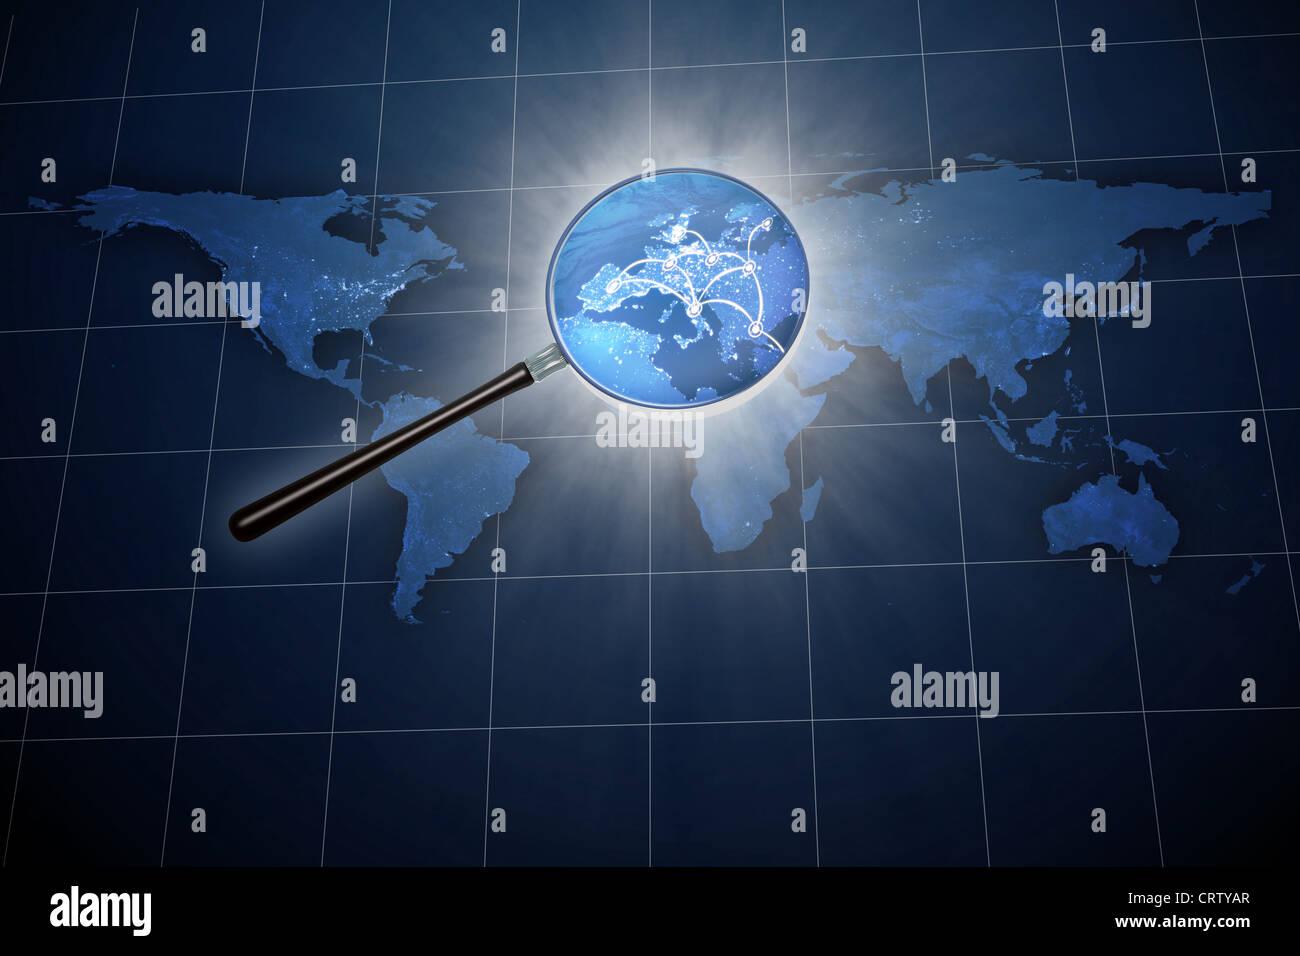 Lupe über die Weltkarte - Europa zoom Stockbild